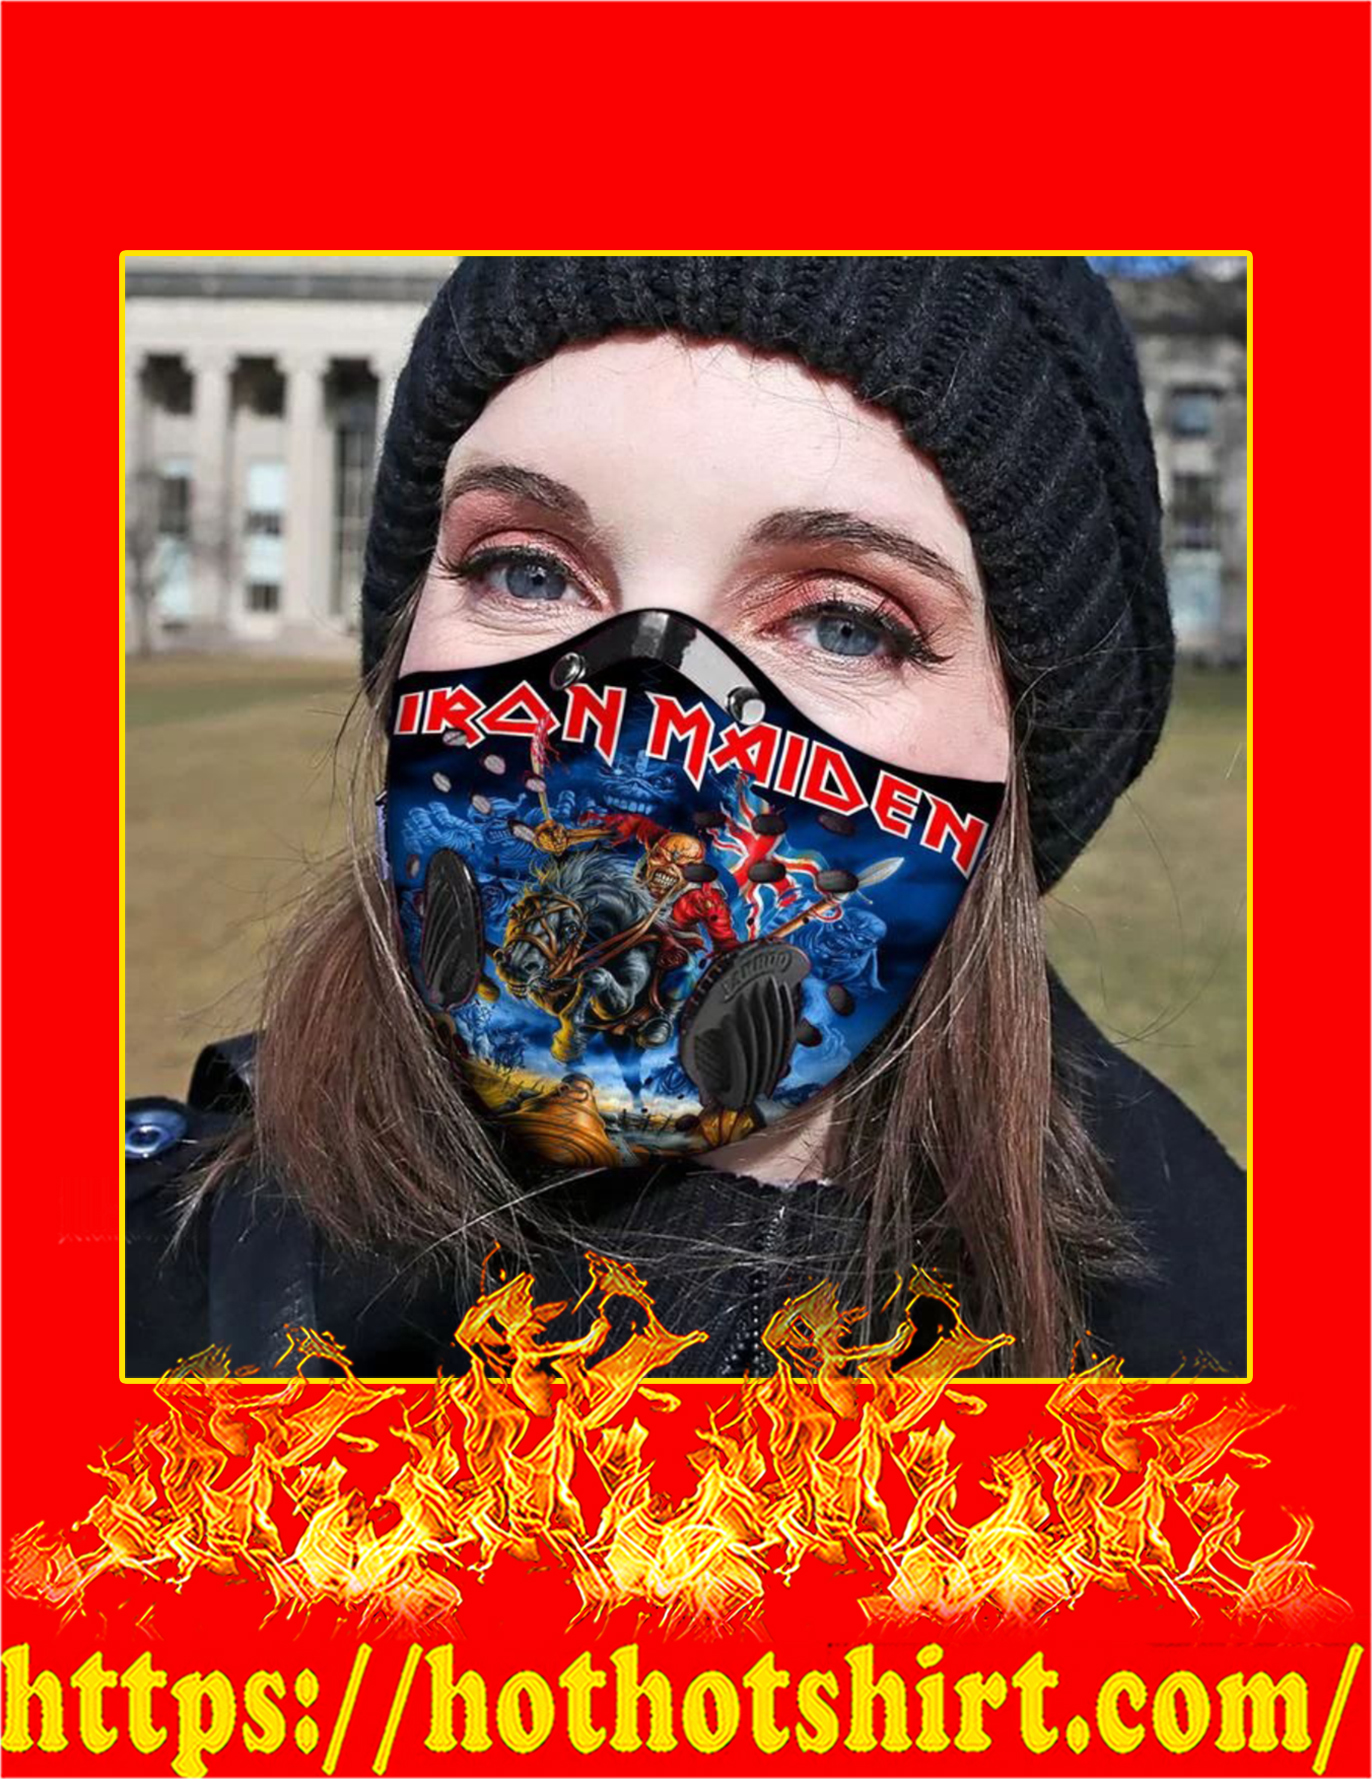 Iron maiden filter face mask - Detail